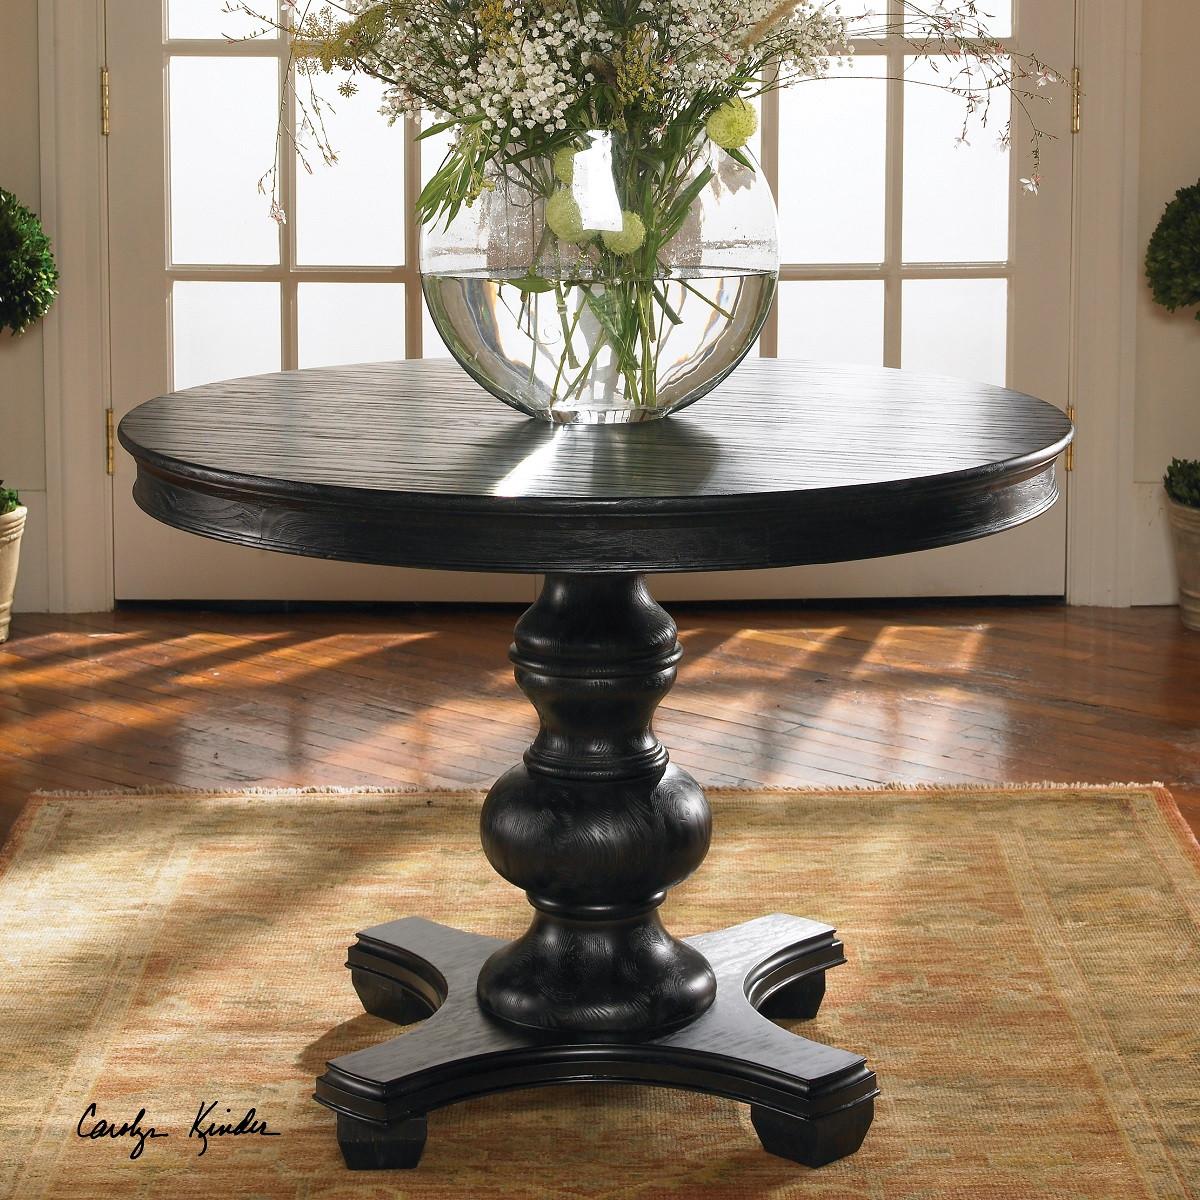 brynmore black round pedestal table 42 round pedestal kitchen table Brynmore black round pedestal accent table 42